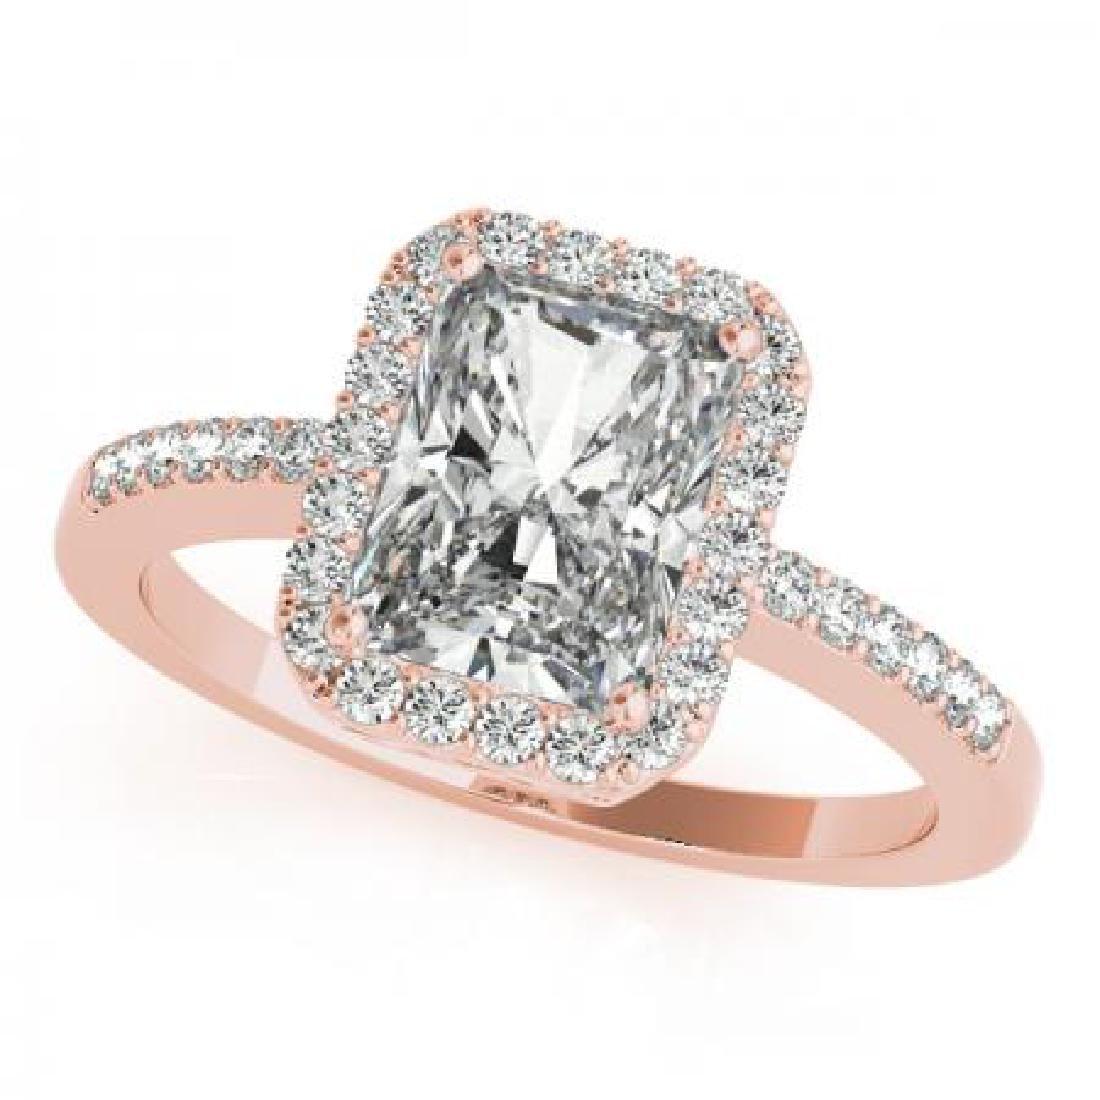 CERTIFIED 18KT ROSE GOLD 1.00 CT G-H/VS-SI1 DIAMOND HAL